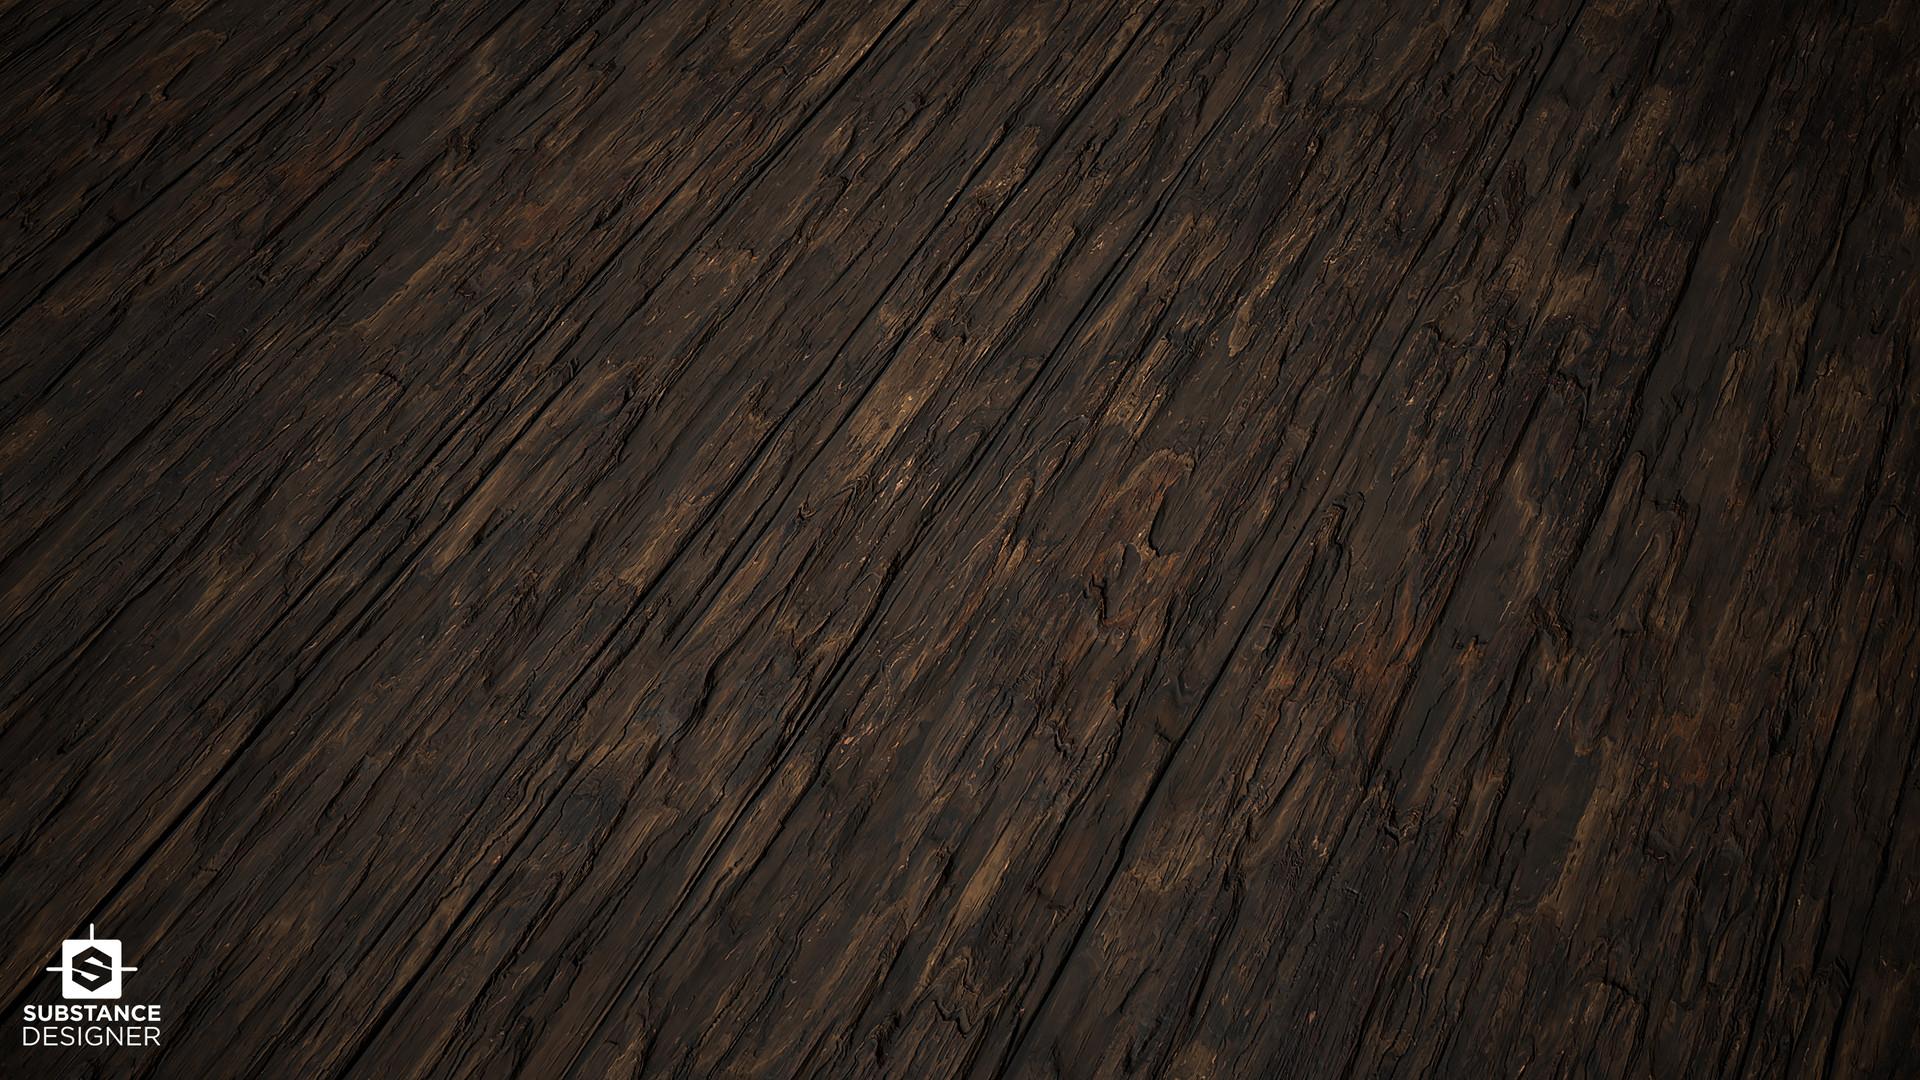 Johan qvarfordt jq wood rough 03 01